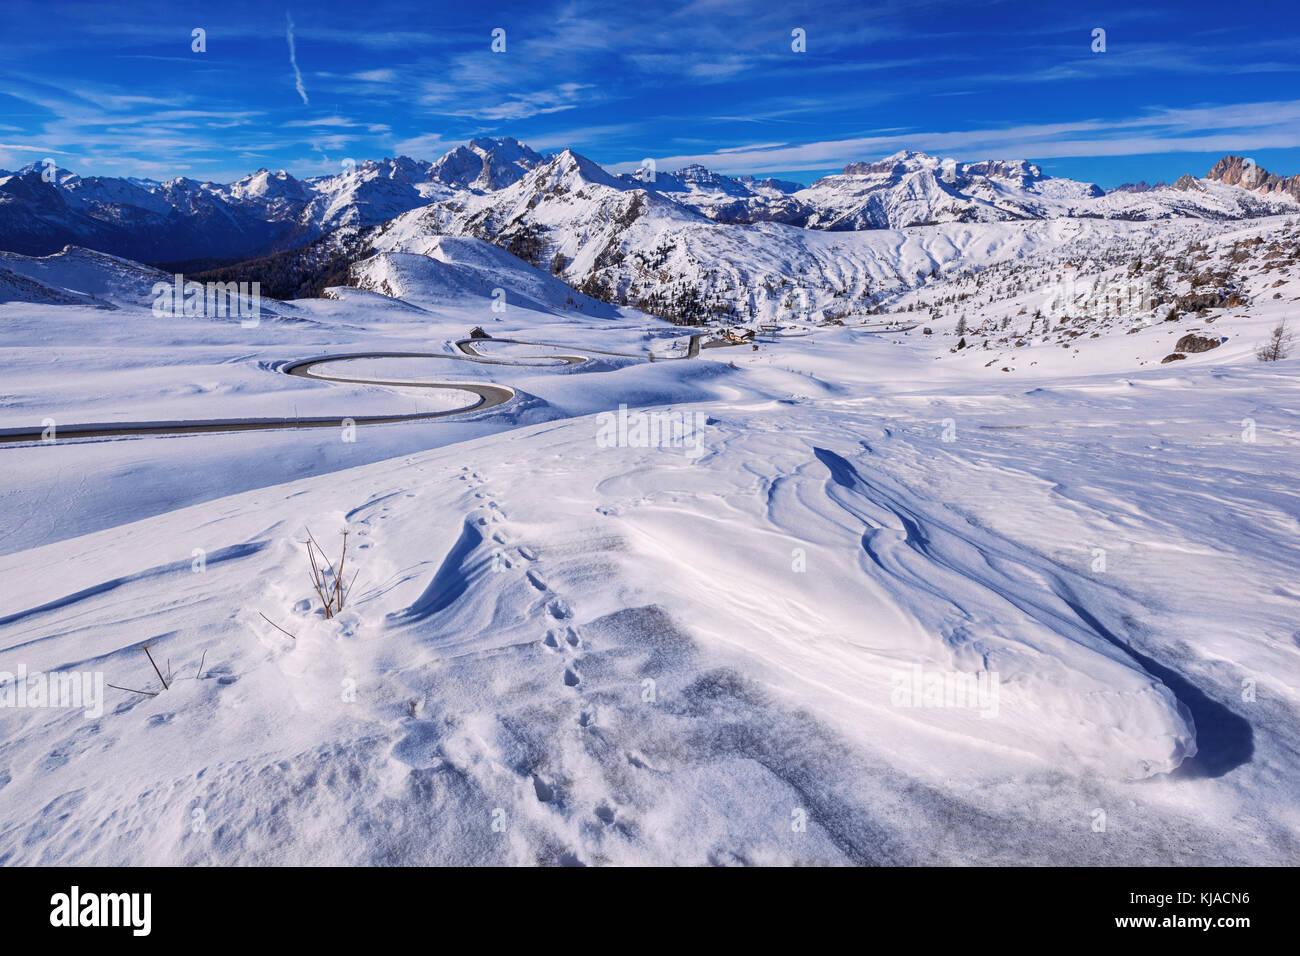 Paisaje de nieve de Passo Giau, Dolomitas, Italia Foto de stock